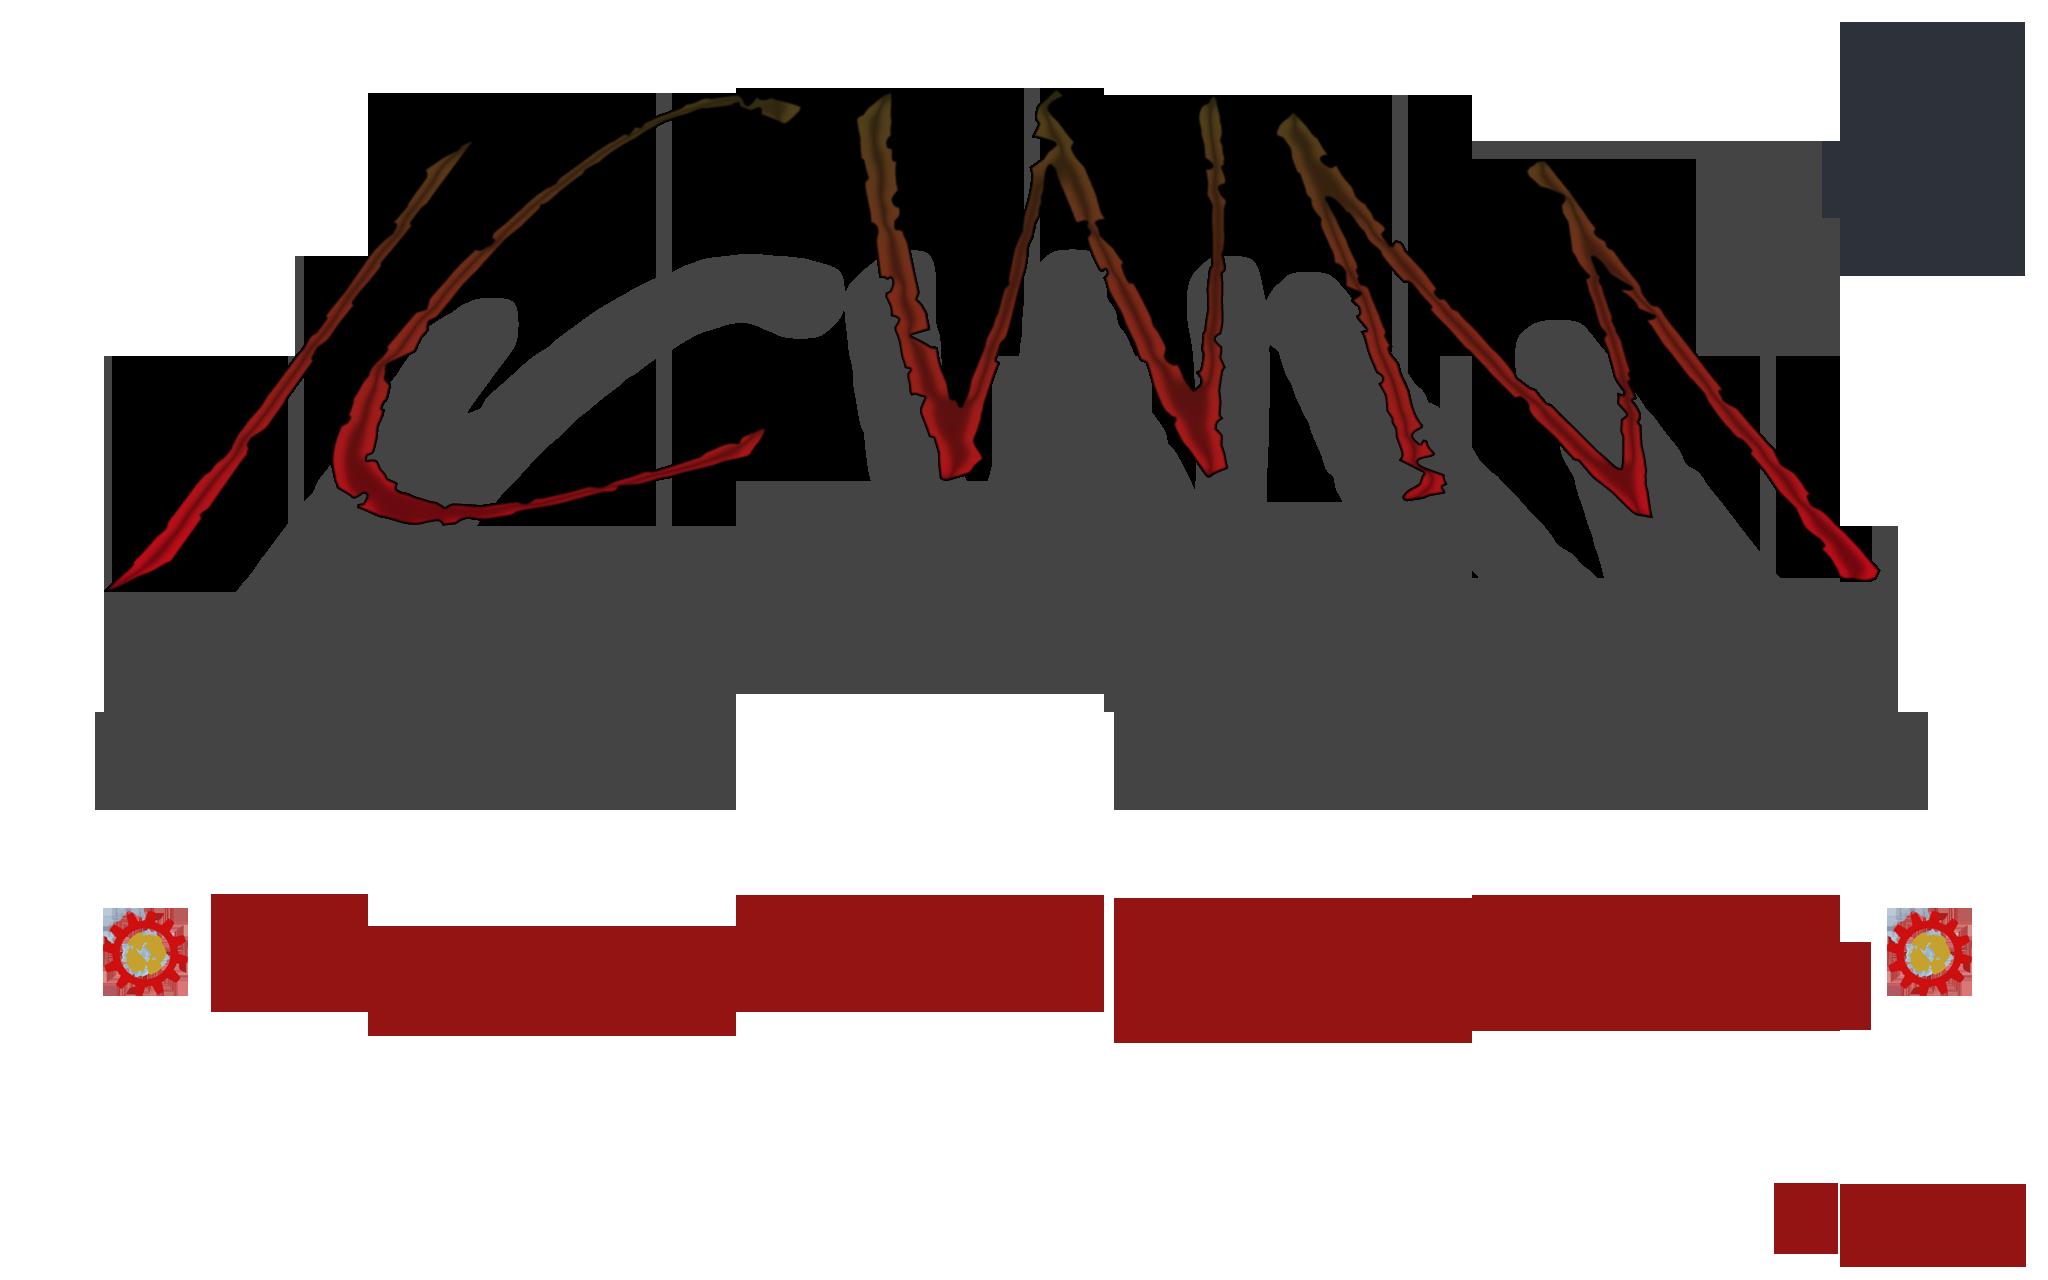 ICWM_logo.png